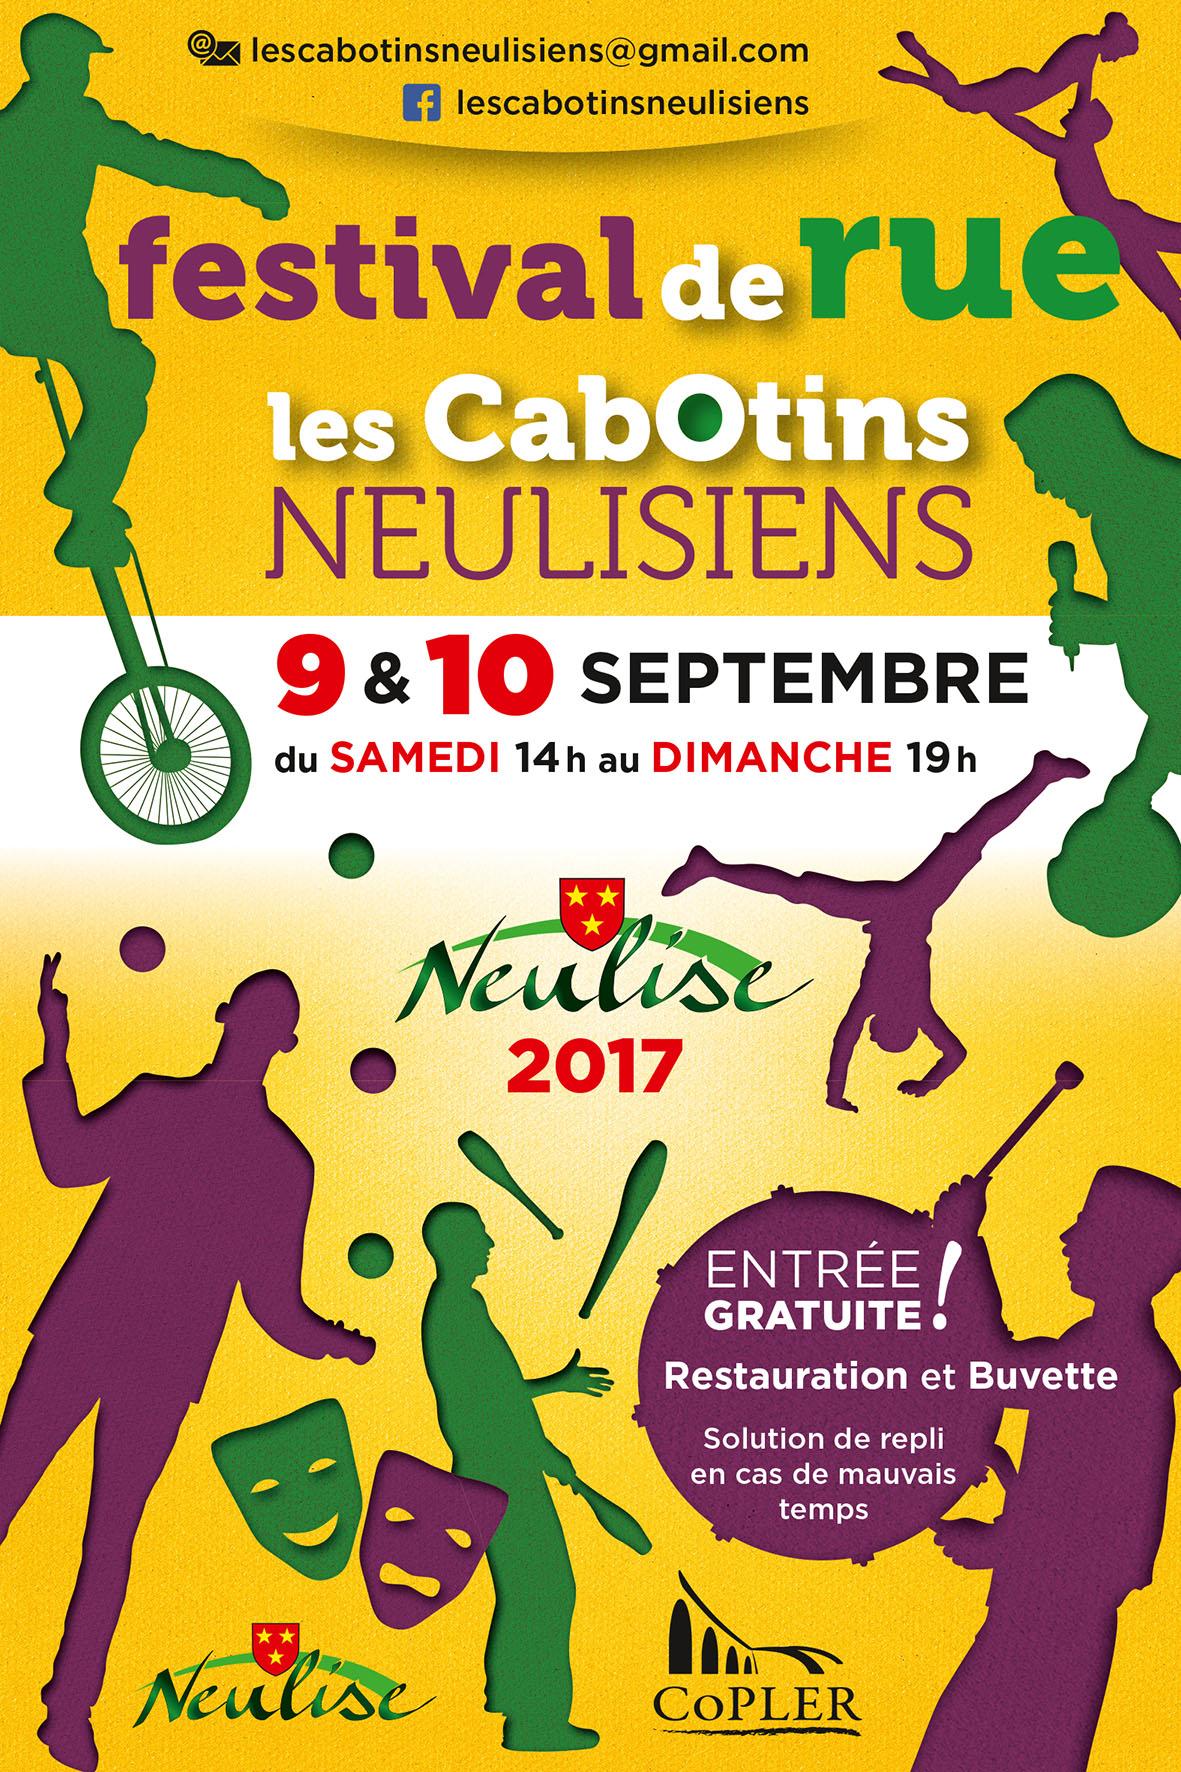 Flyer recto Festival de rue les Cabotins Neulisiens